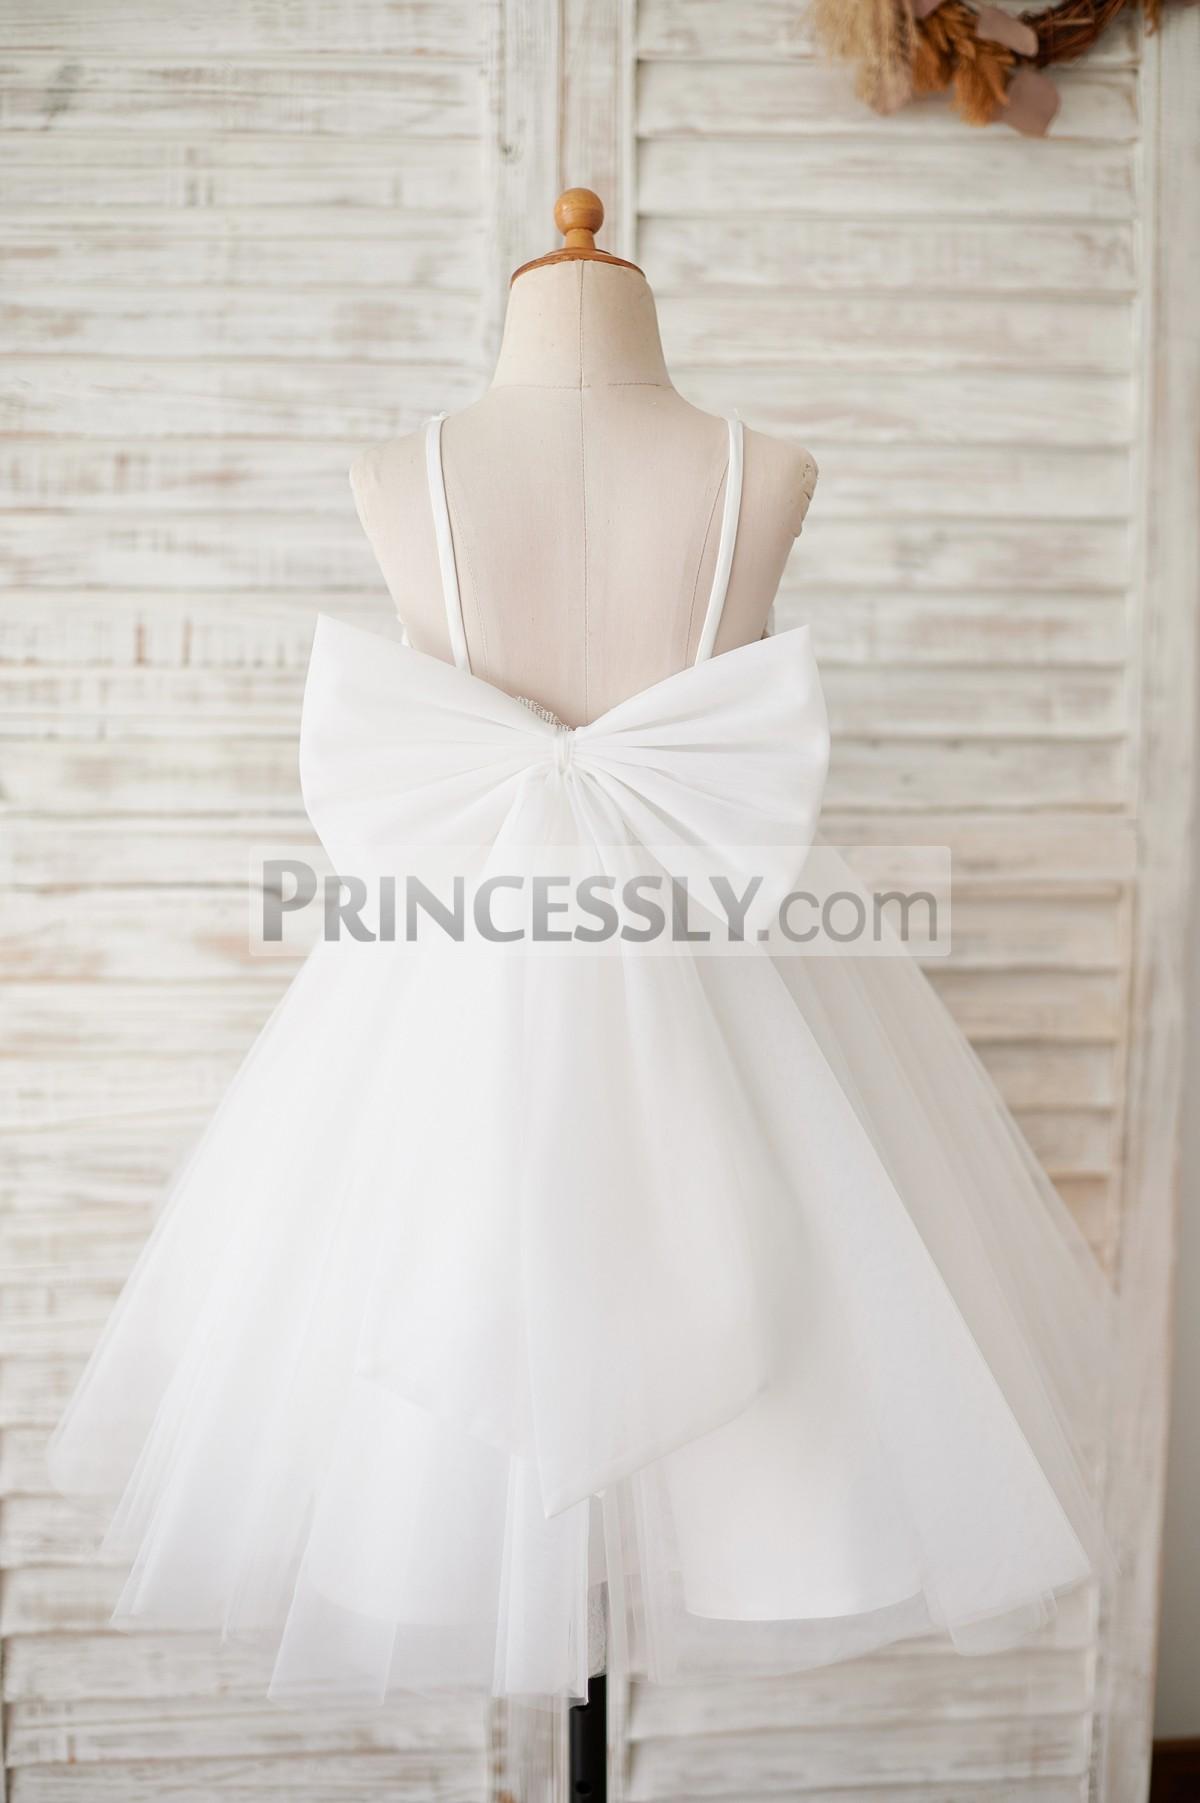 Spaghetti straps backless ivory wedding baby girl dress